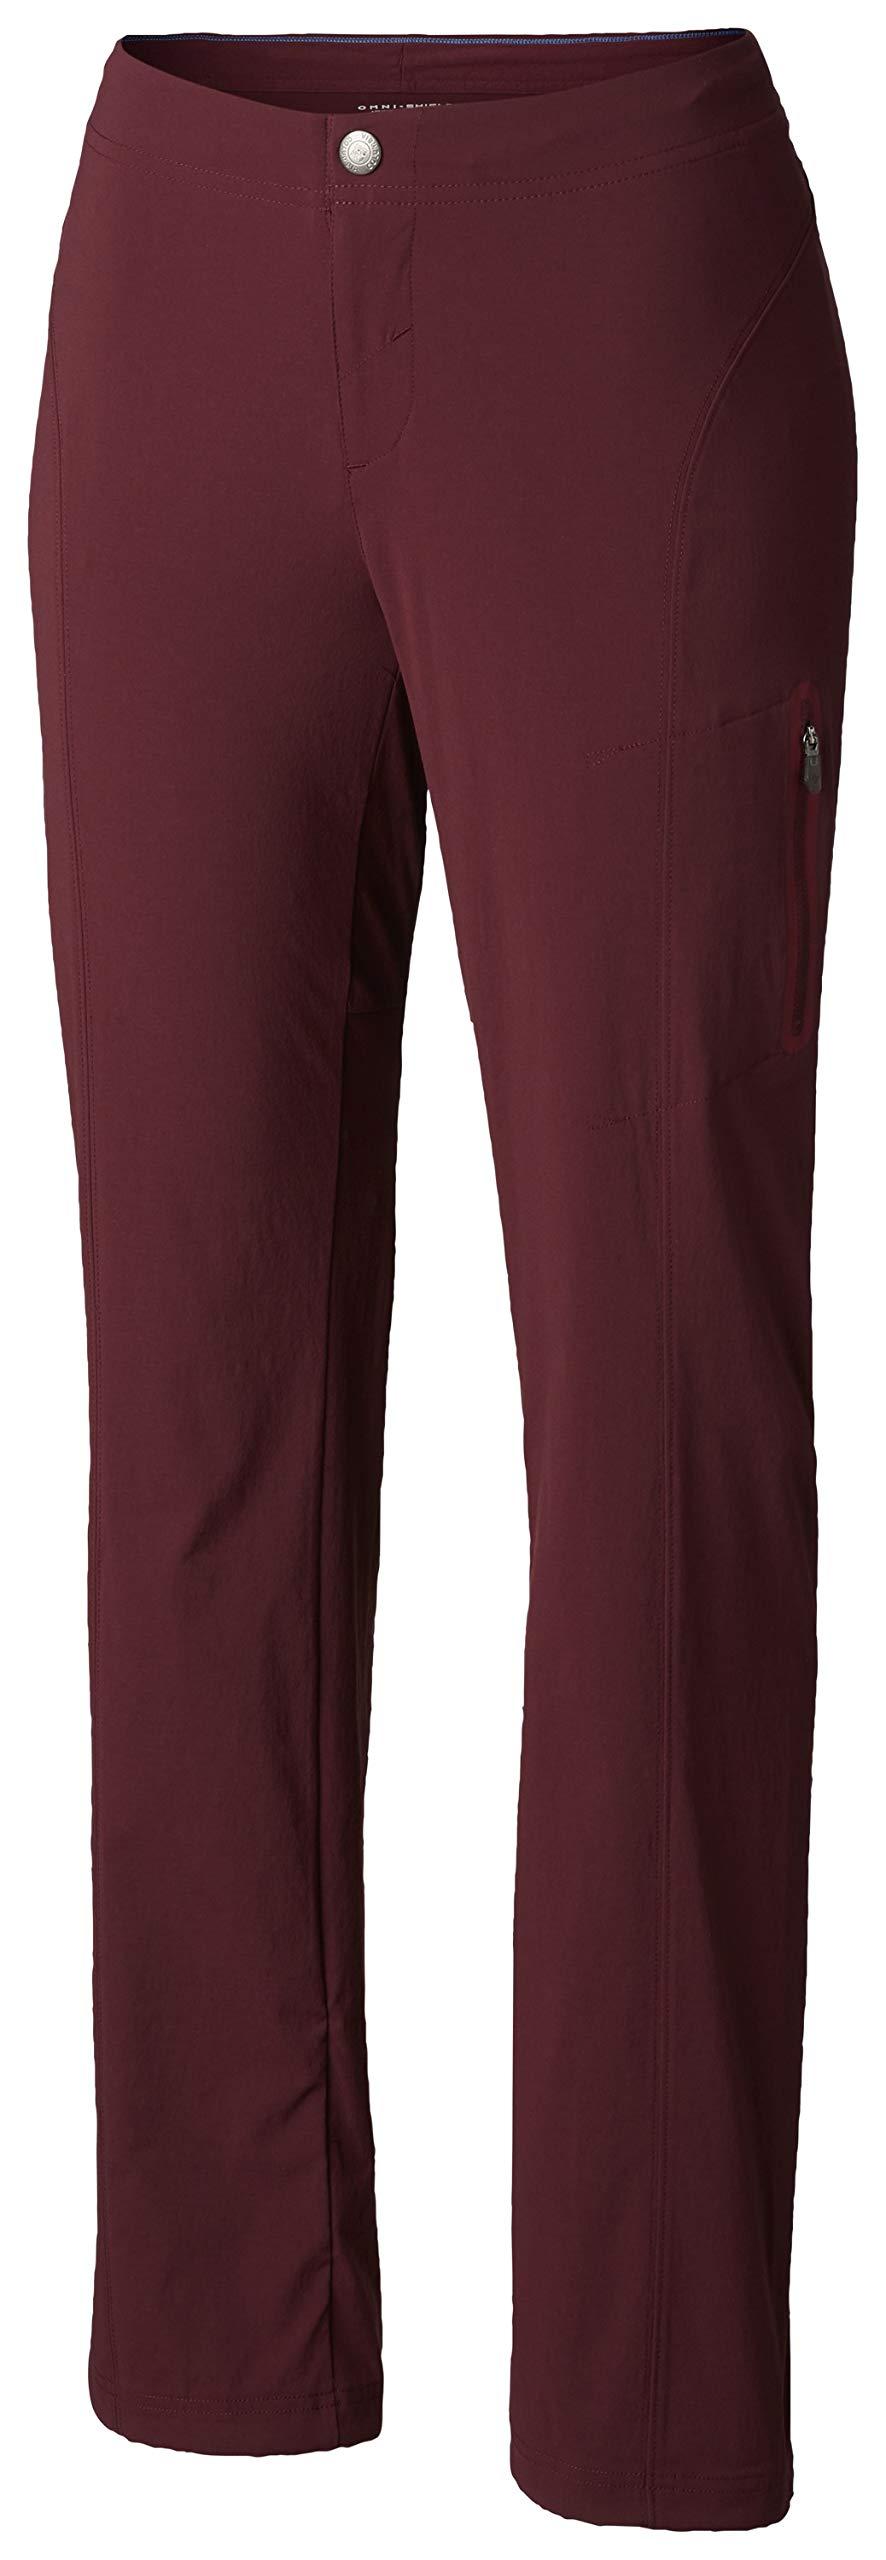 Columbia Women's Just Right Straight Leg Pant, Deep Madeira 4 Short